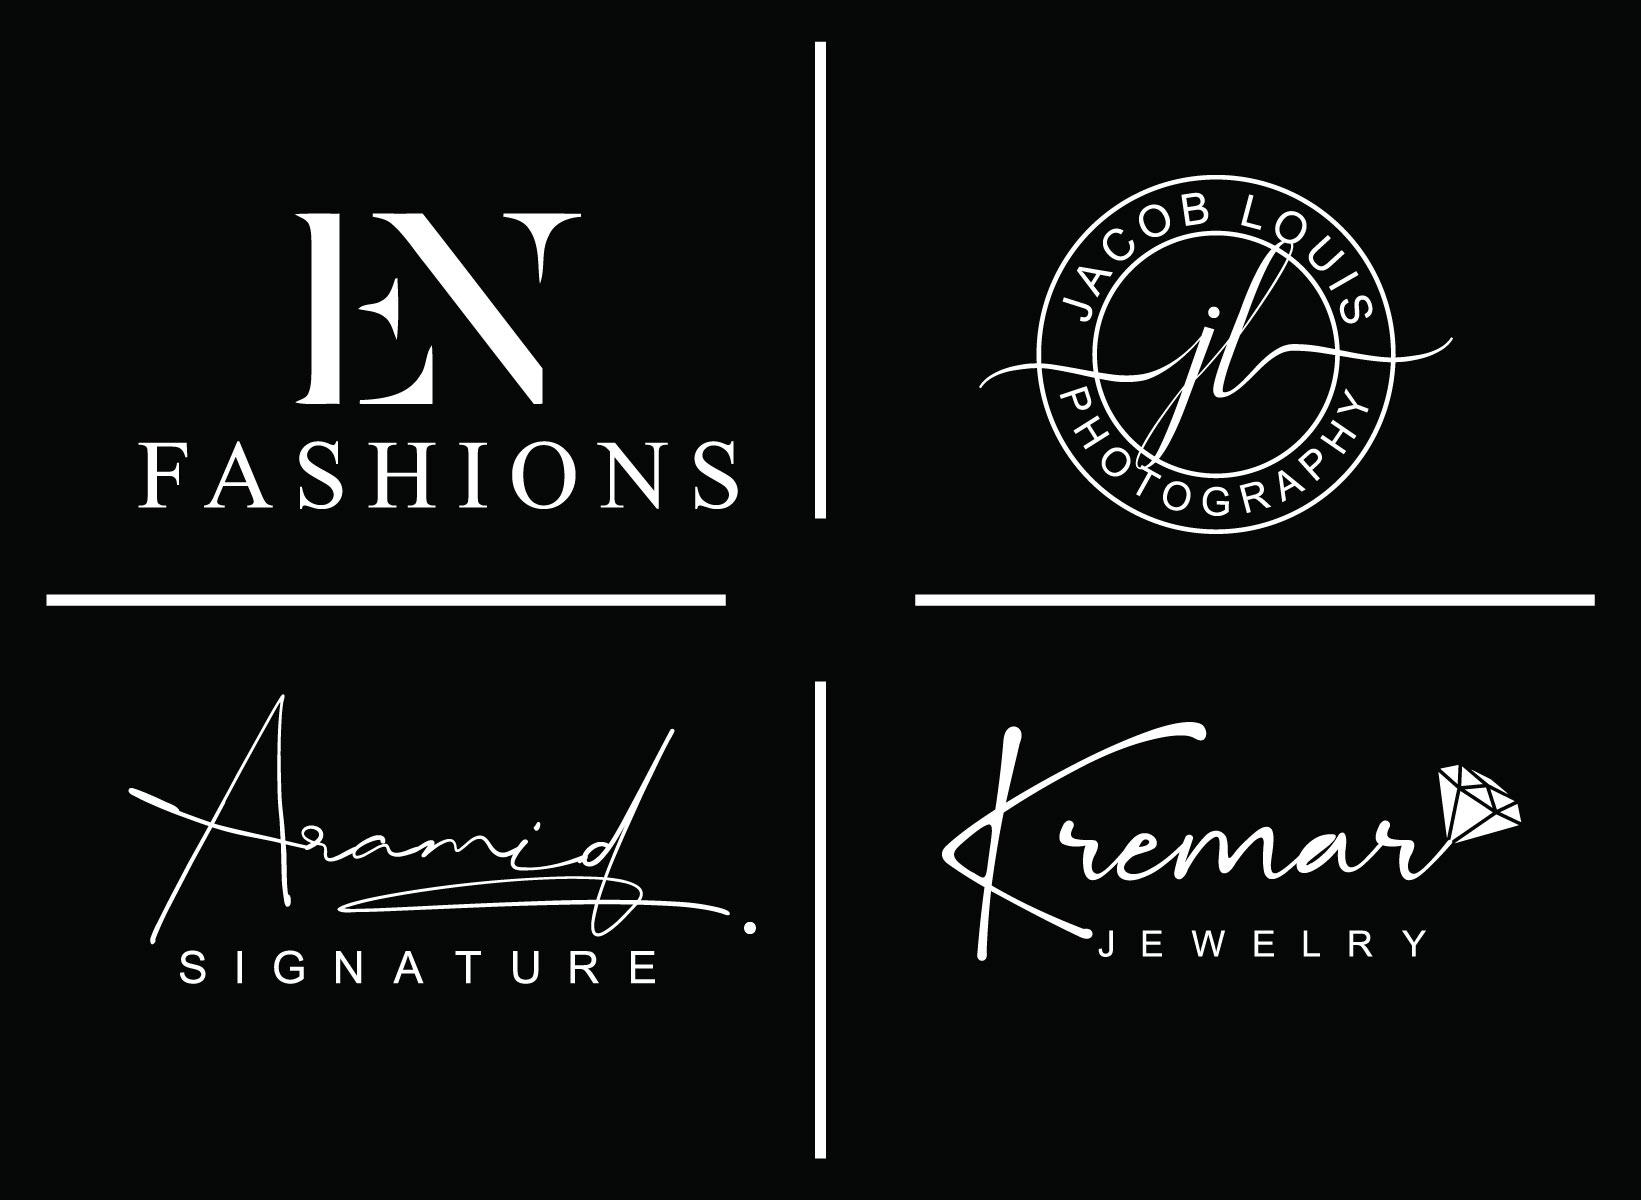 i will Do signature photography fashion Boutique logo design